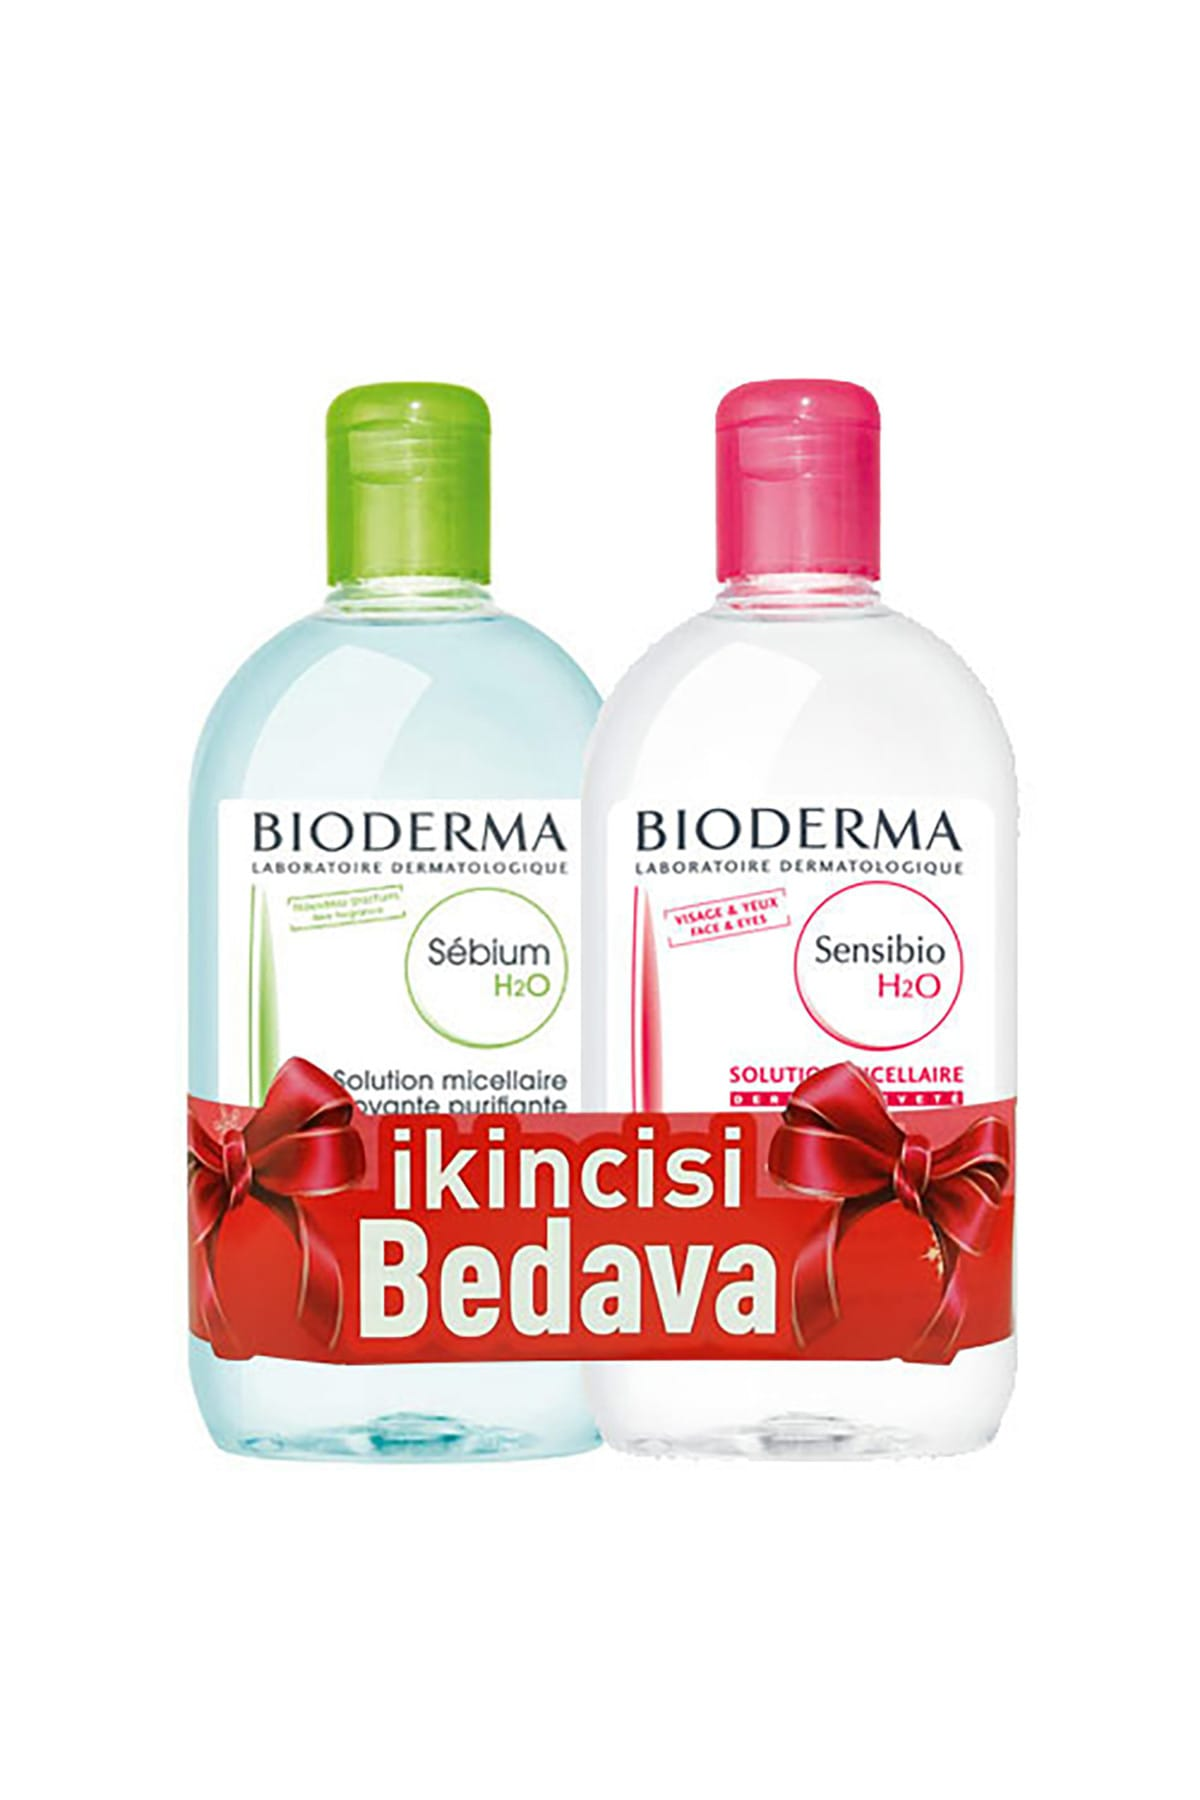 Bioderma Sebium H2O 500 ml + Sensibio H2O 500 ml sebium-sensibioh2o 1